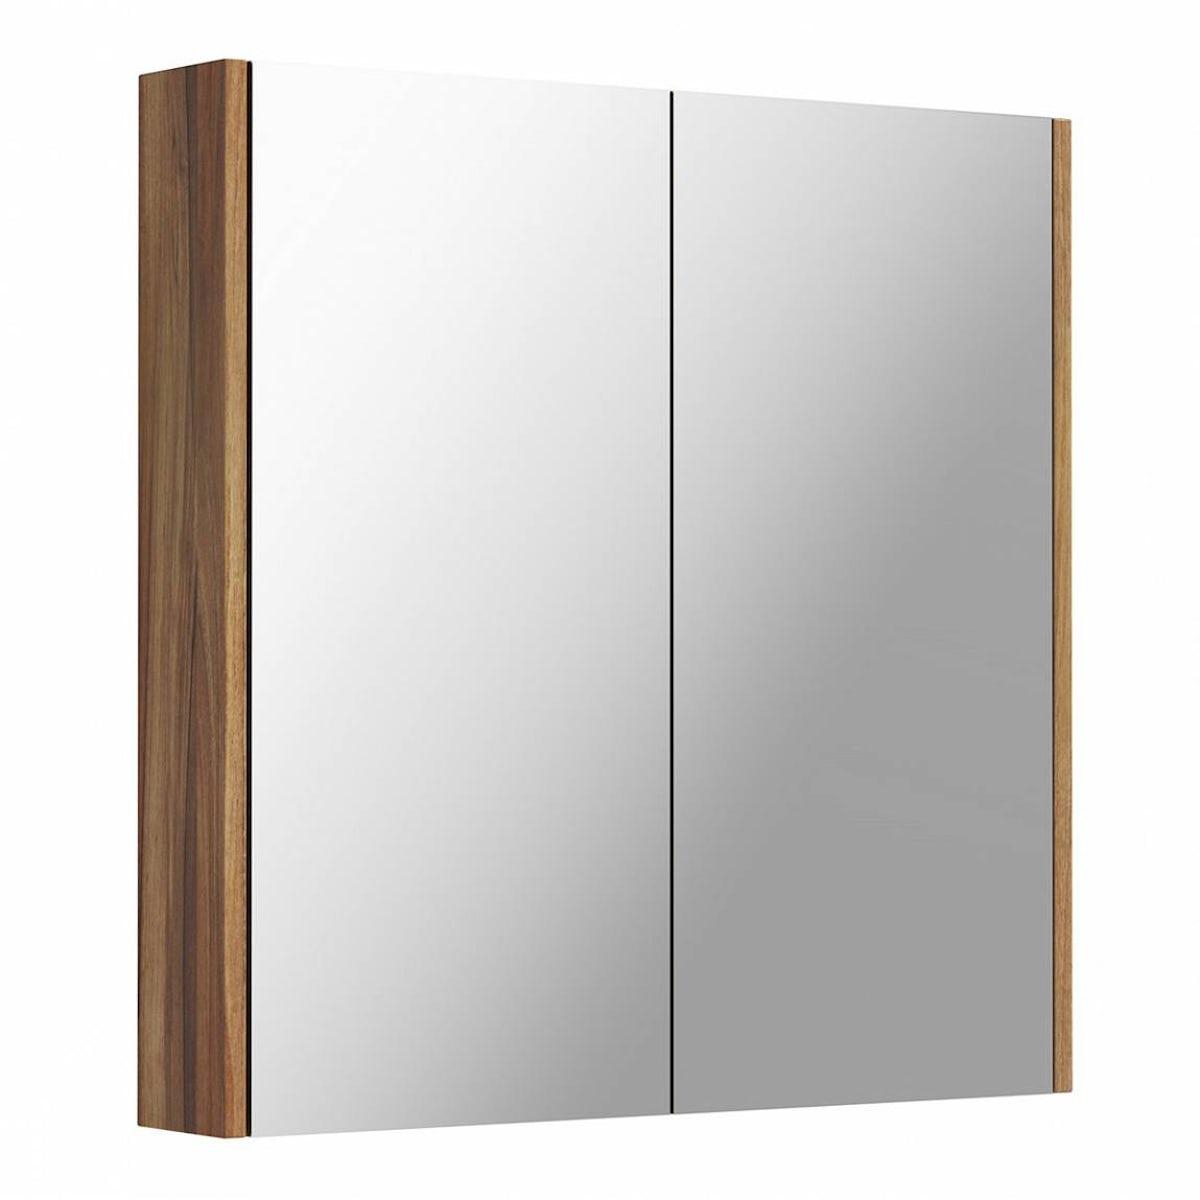 Walnut 2 Door Bathroom Mirror Cabinet